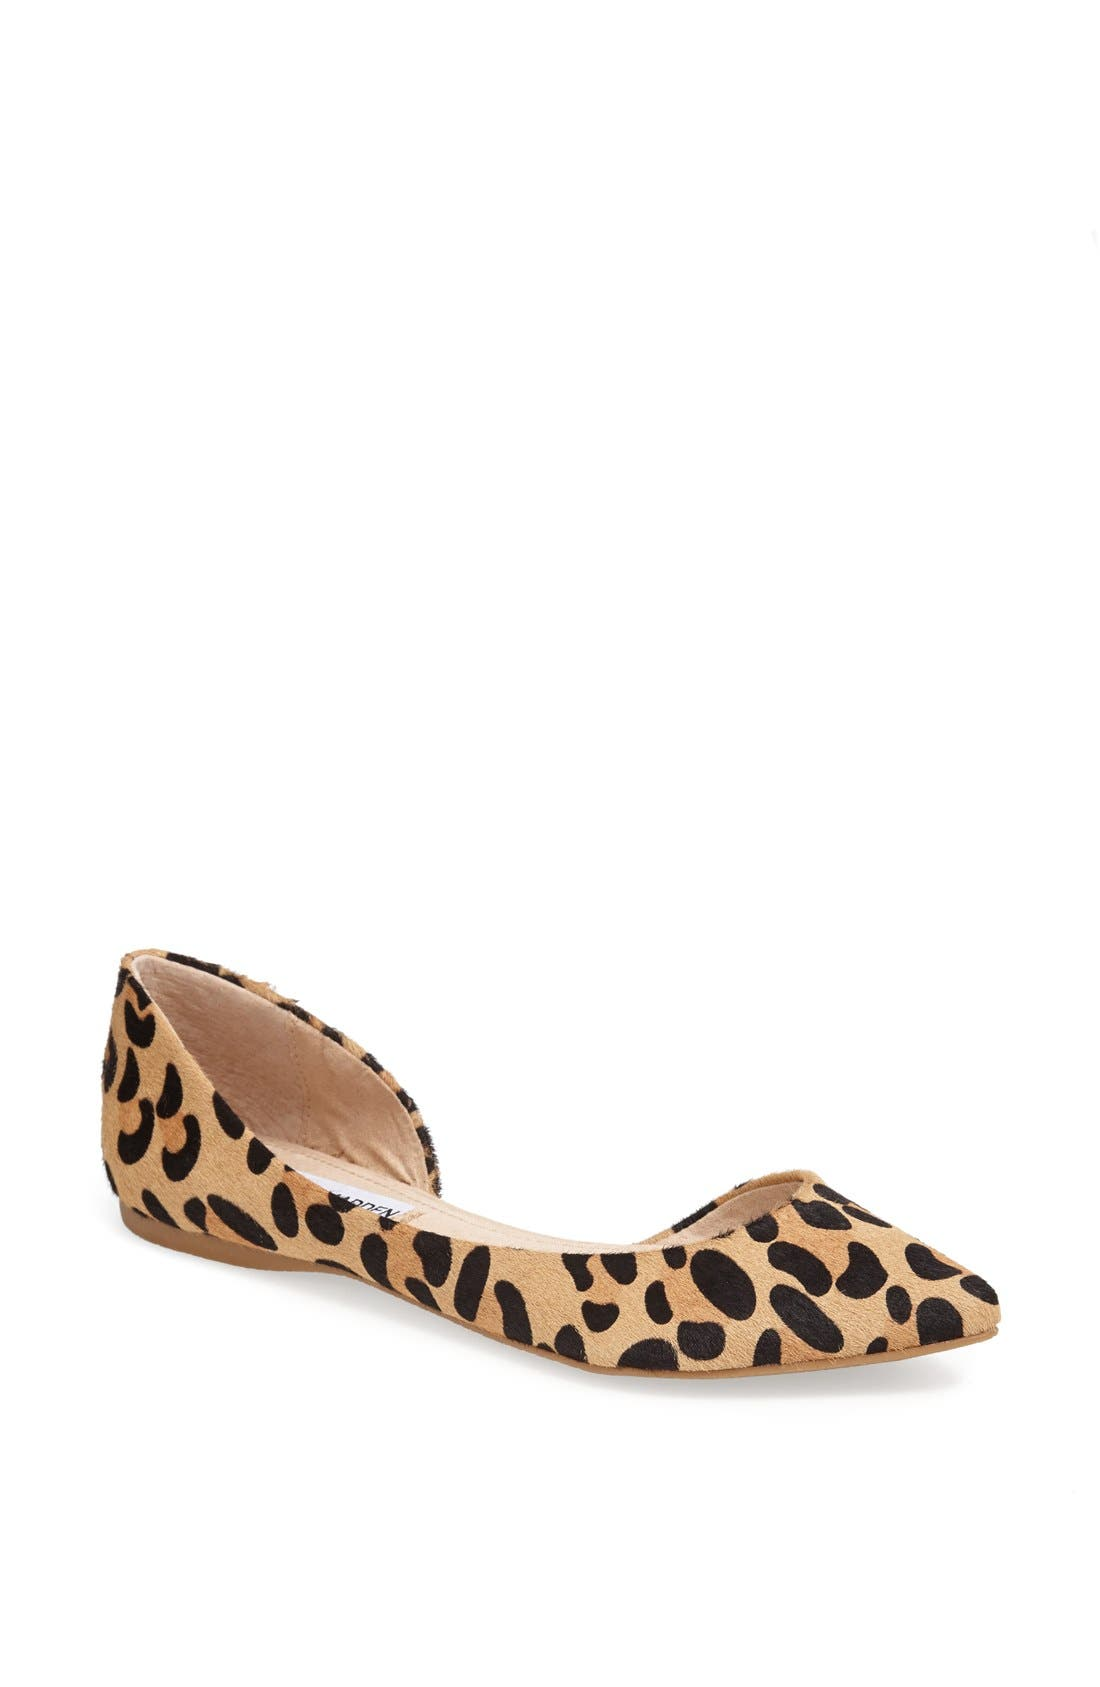 Alternate Image 1 Selected - Steve Madden 'Elusion' Leopard Print Calf Hair Half d'Orsay Flat